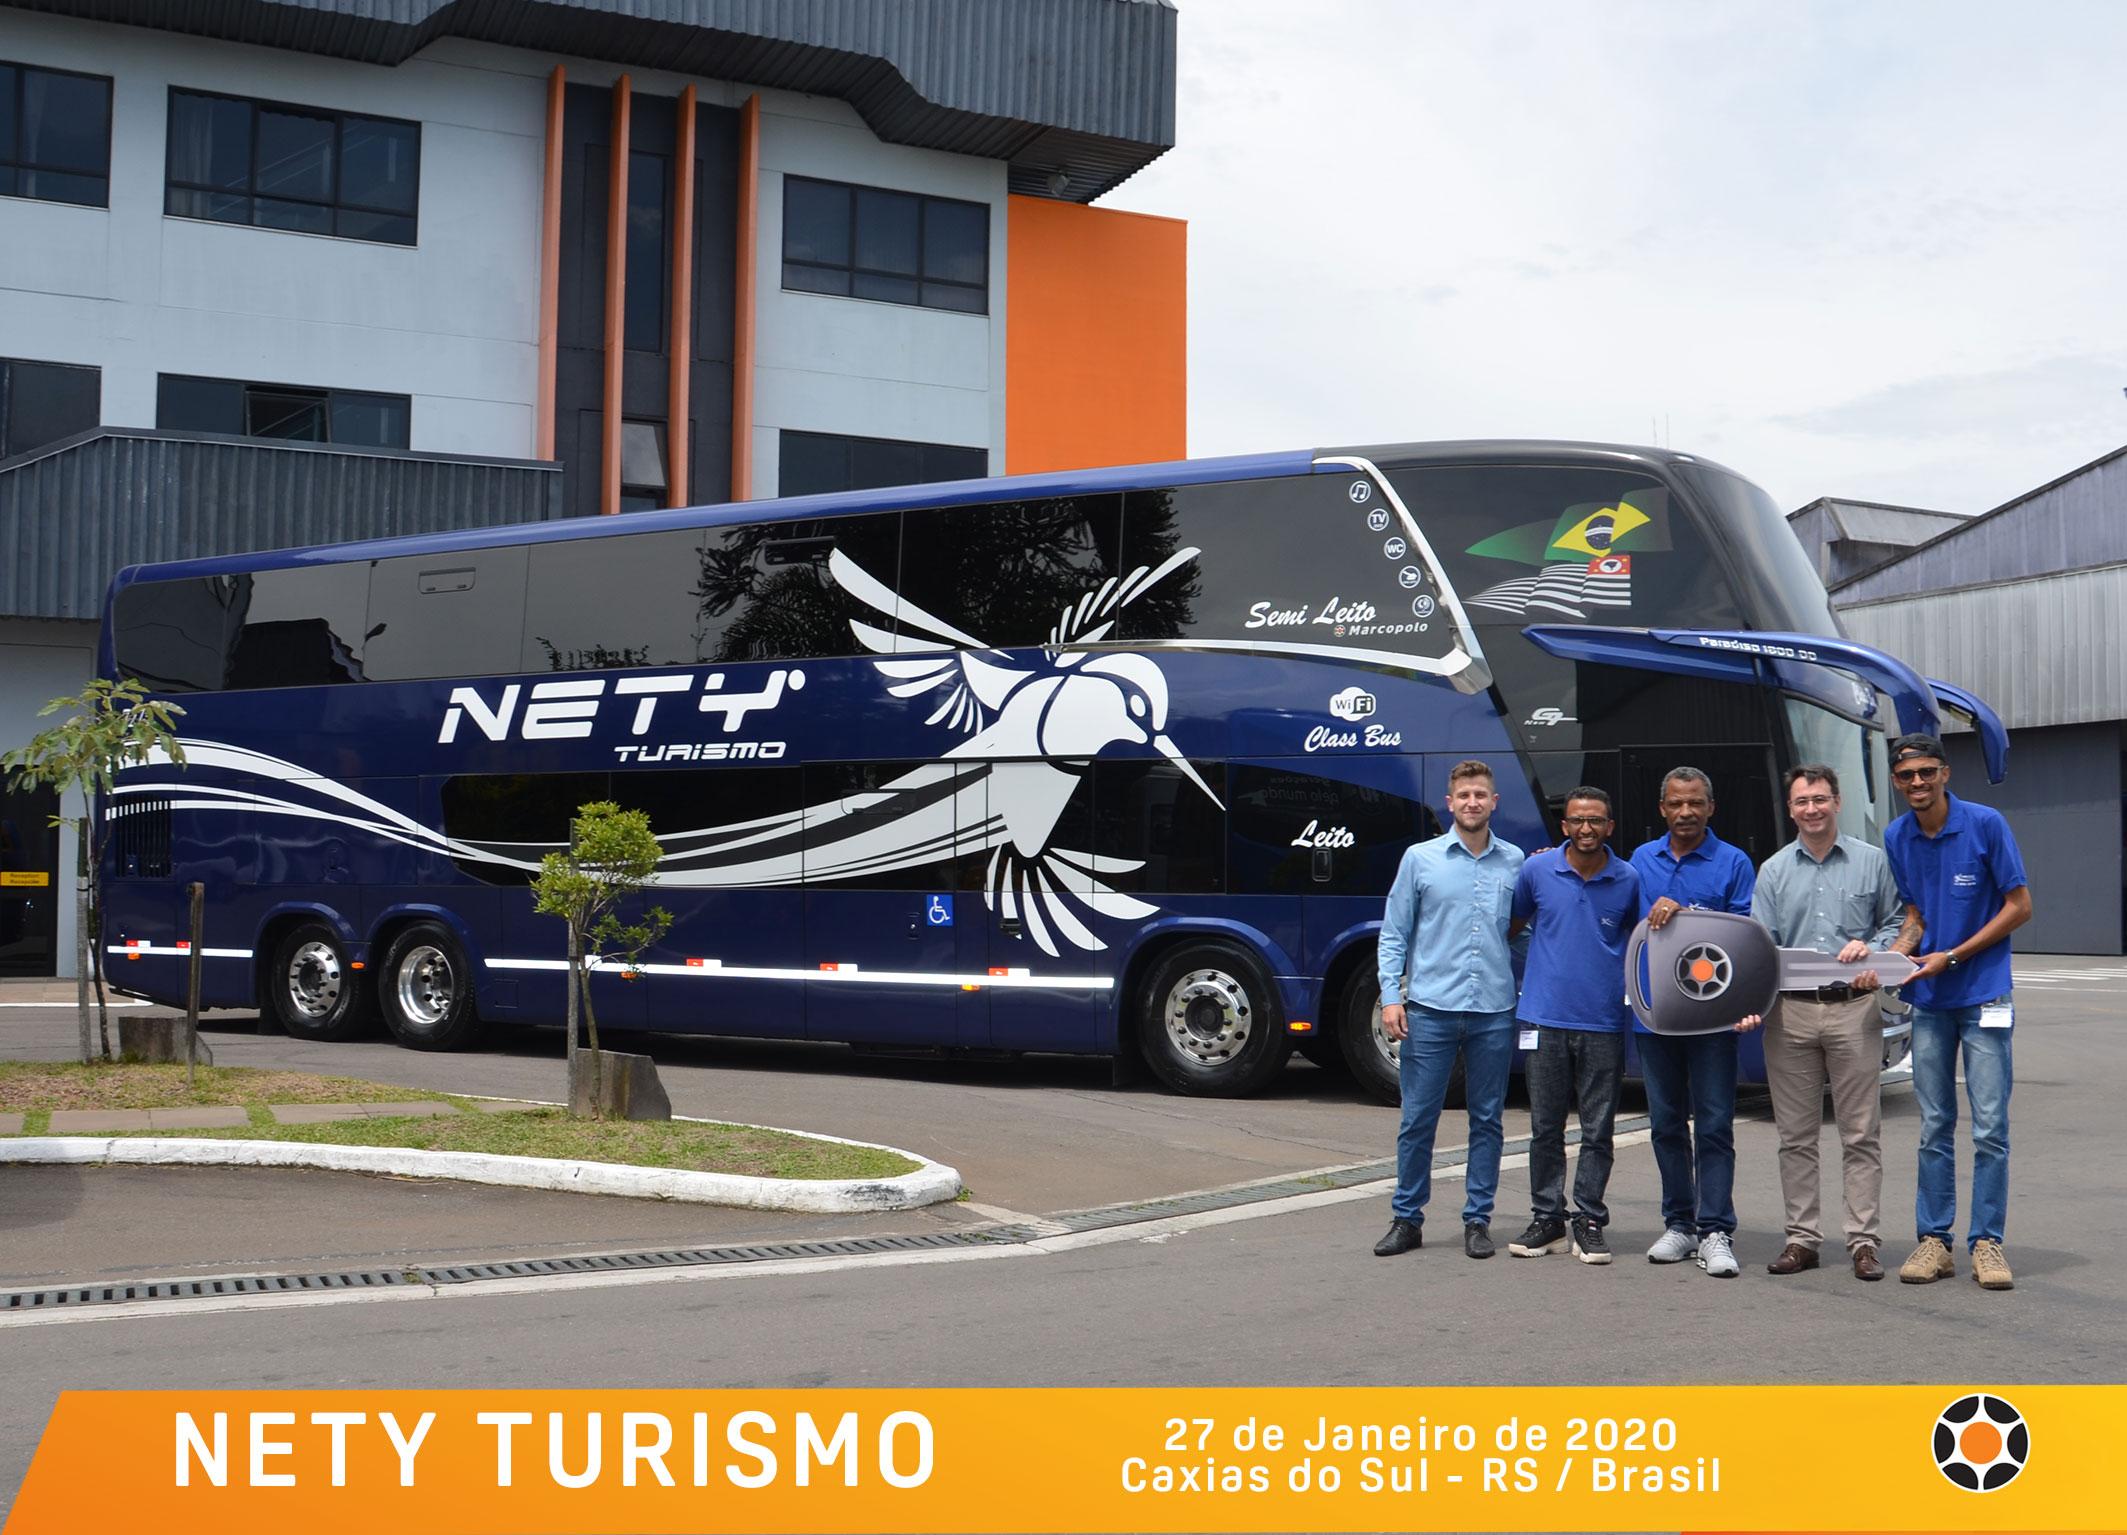 NETY-TURISMO